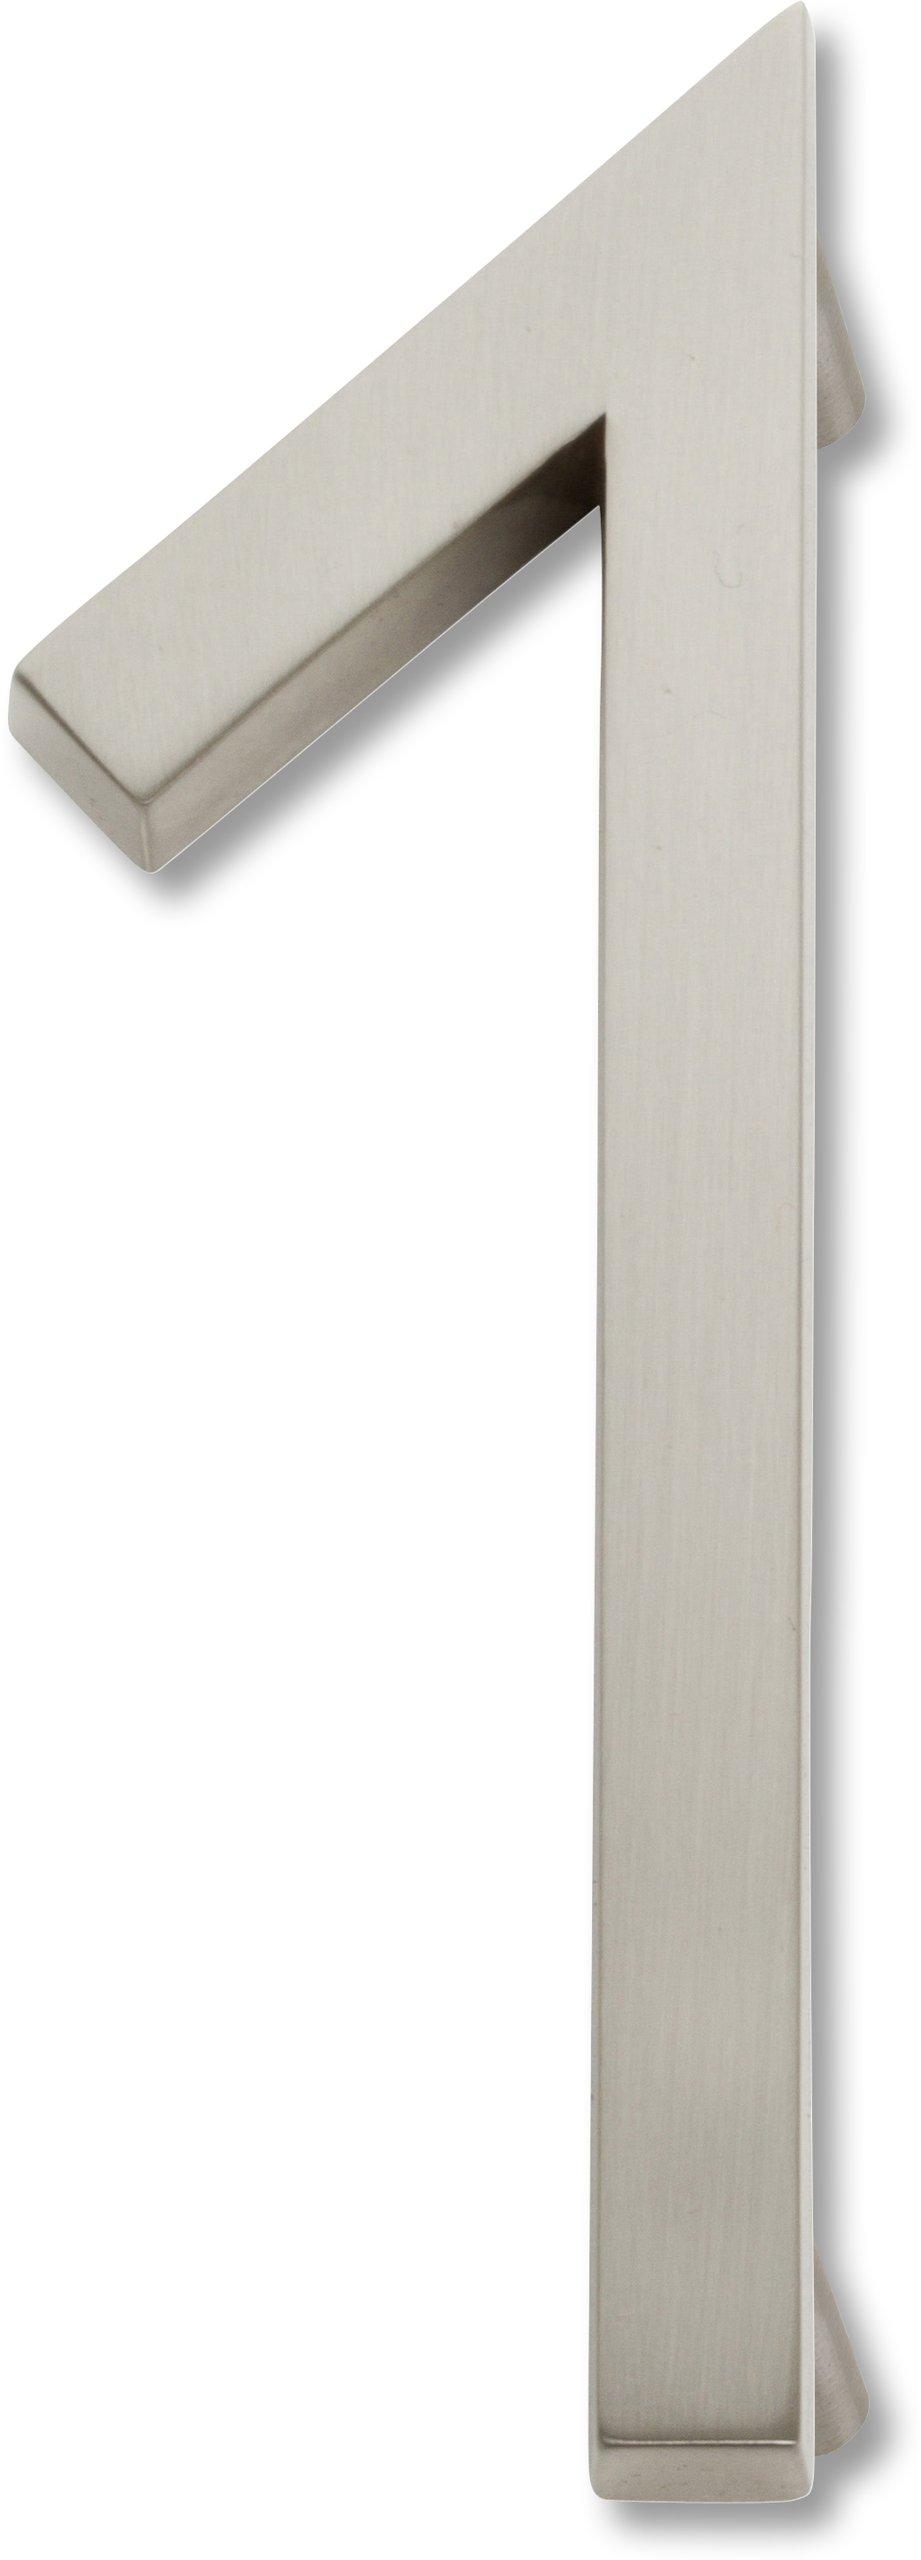 Atlas Homewares AVN1-BRN Modern Avalon House Number, One, Brushed Nickel